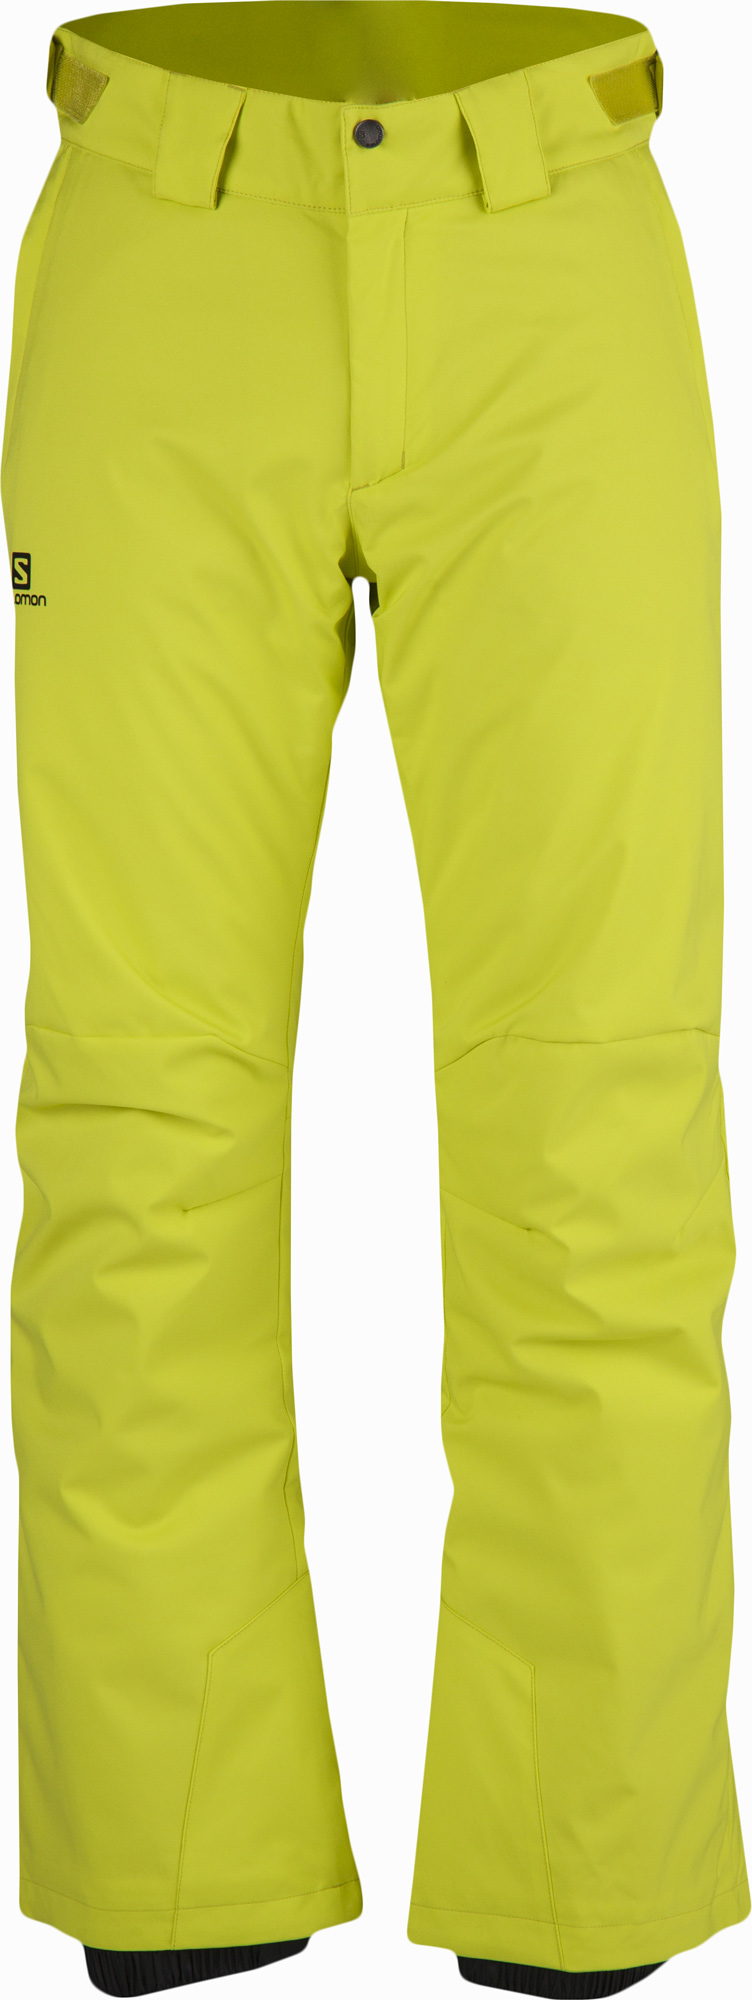 Salomon STORMPUNCH PANT M. Men s winter pants. Men s winter pants 569e5042fa8